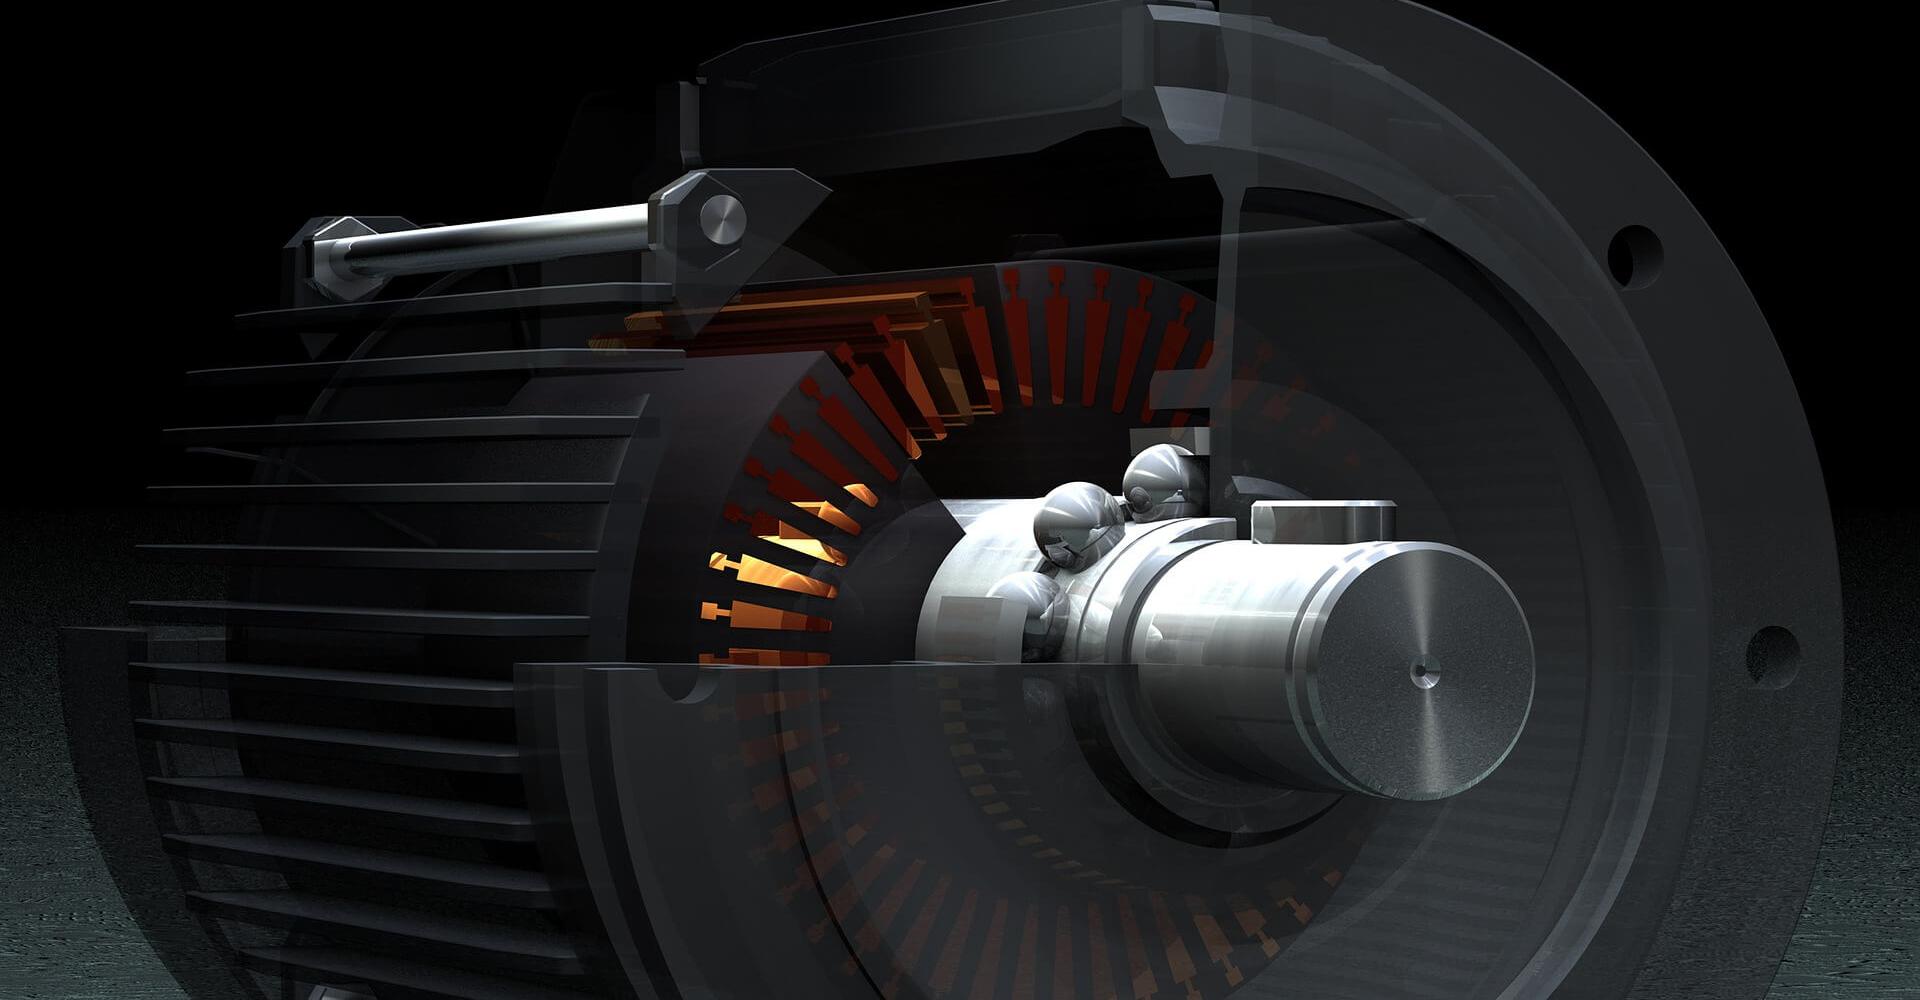 Ball bearings - lubrication-reliability